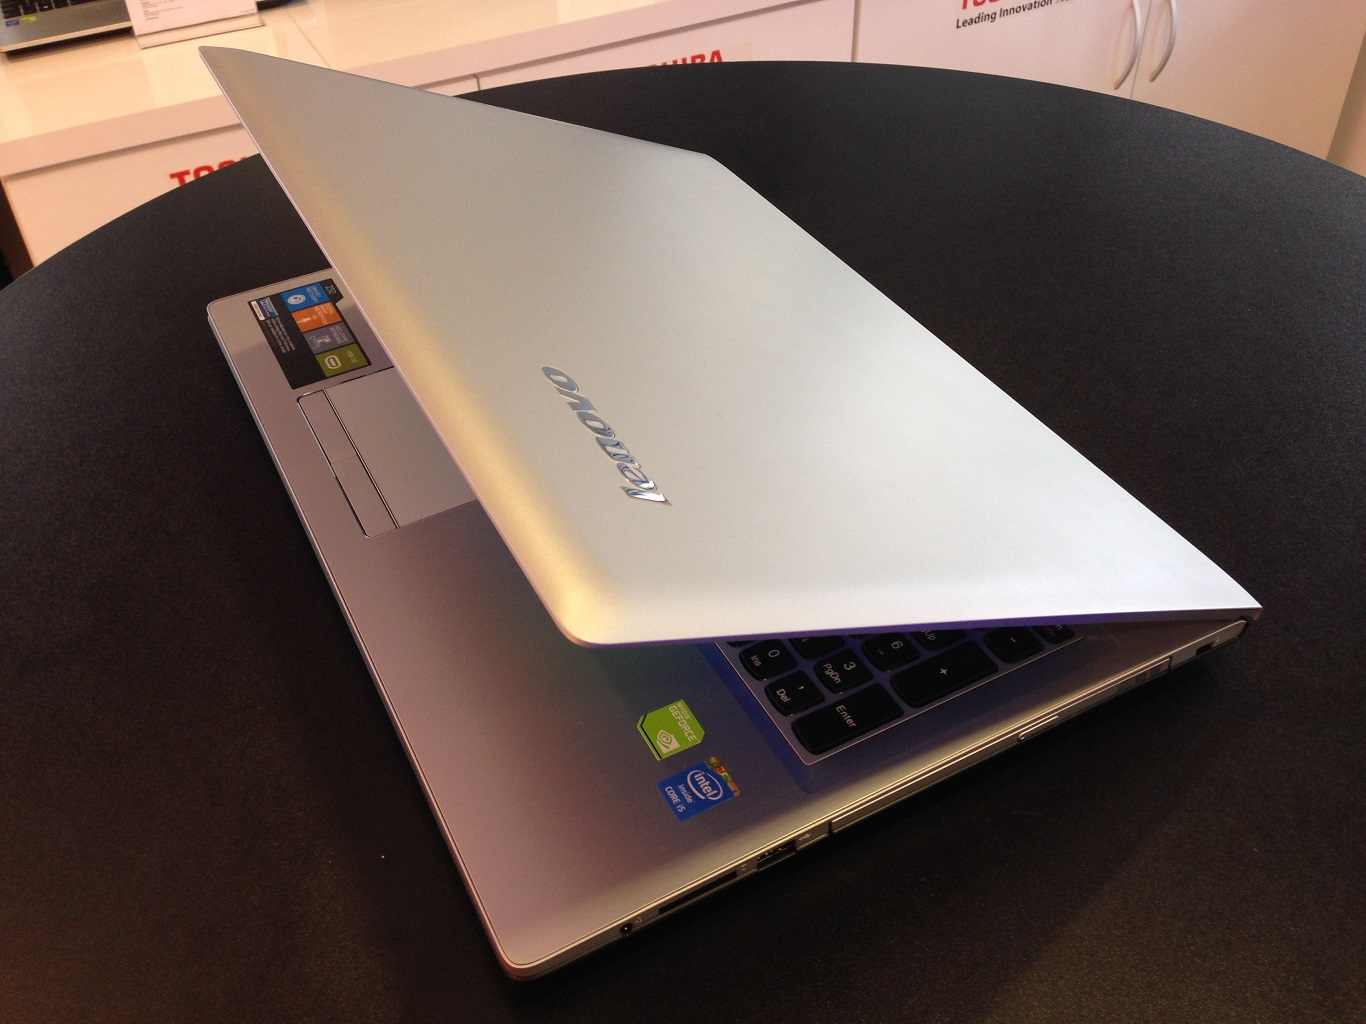 Lenovo IdeaPad Z50-70 teszt